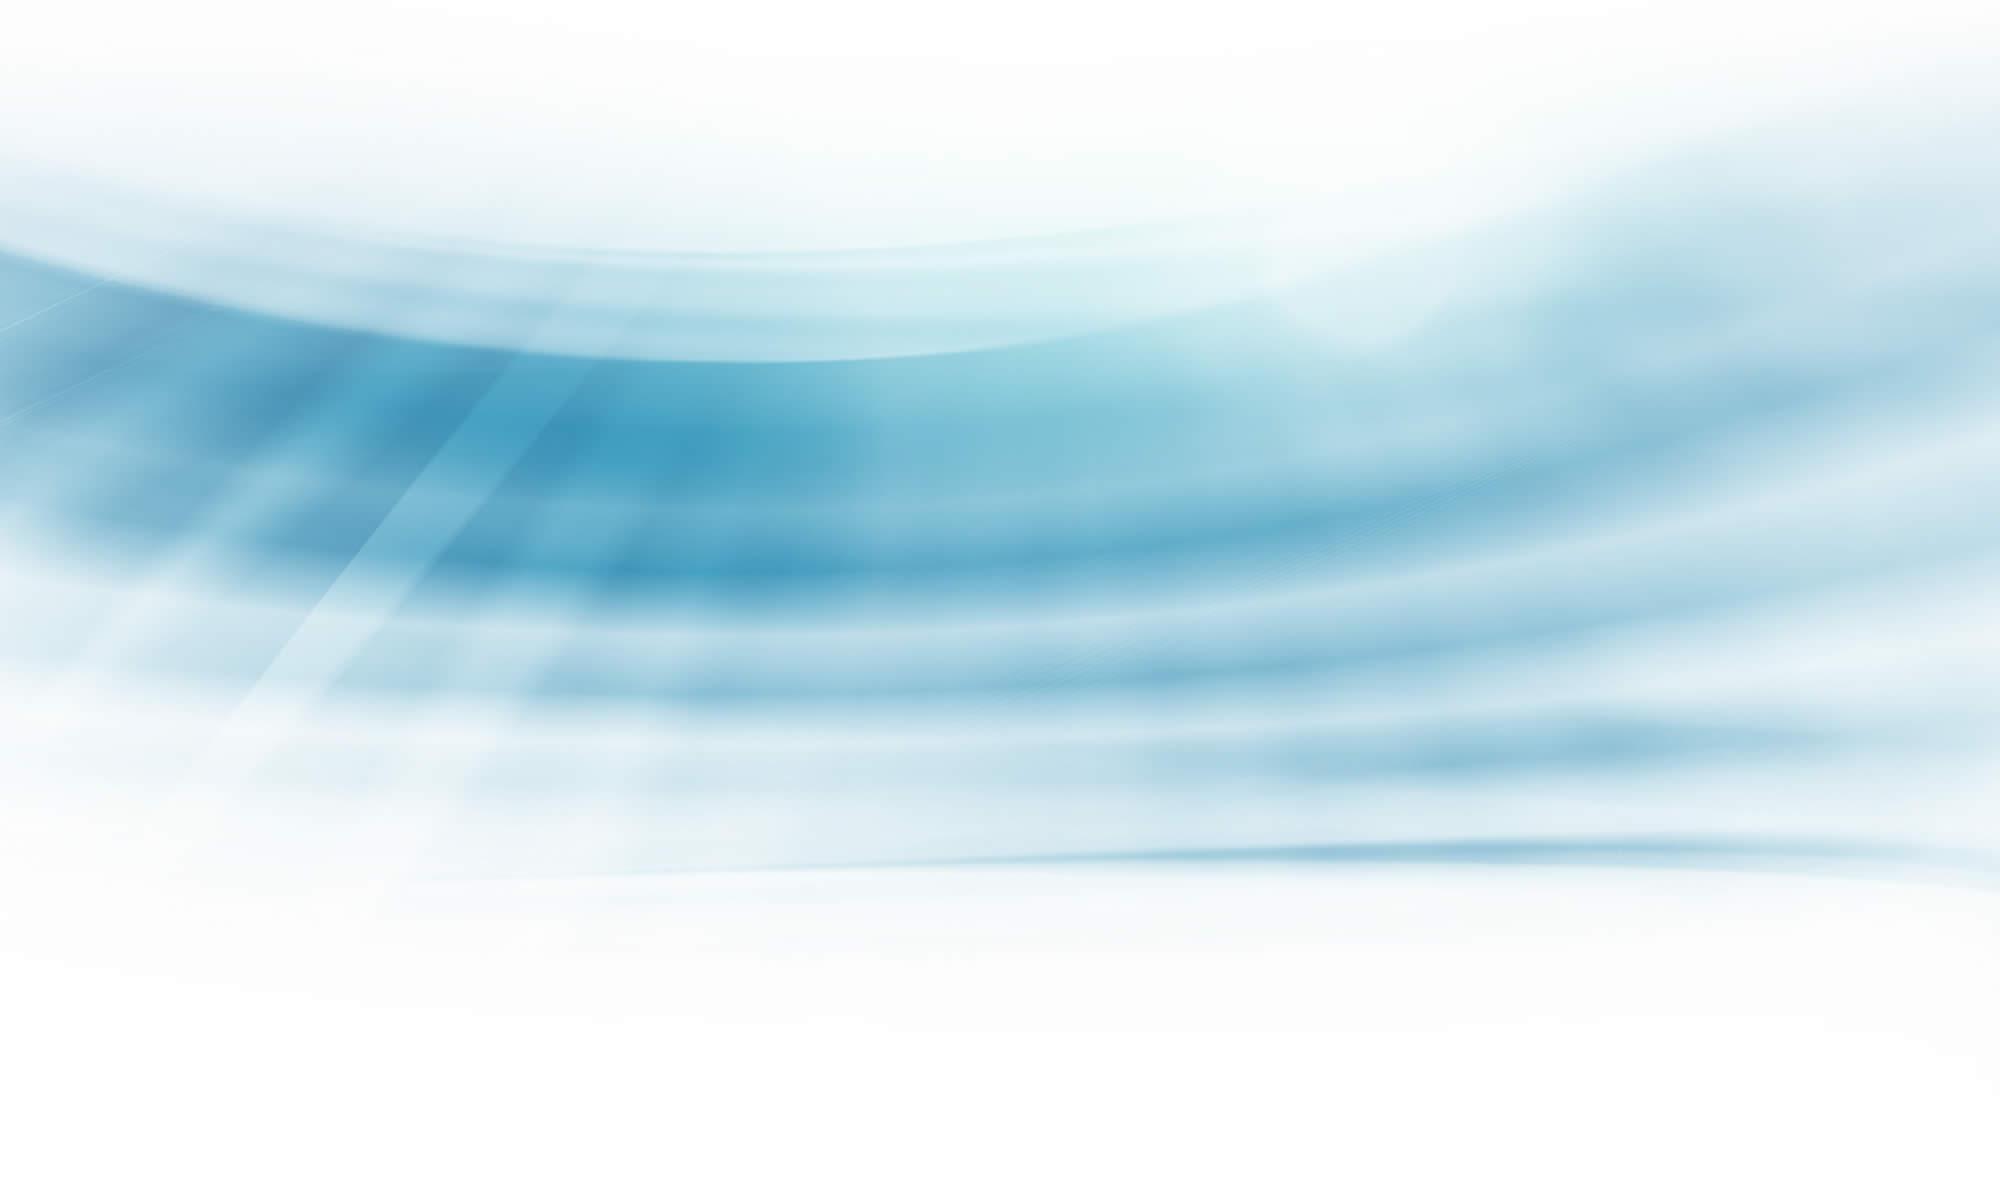 bg-wave-rays-blue